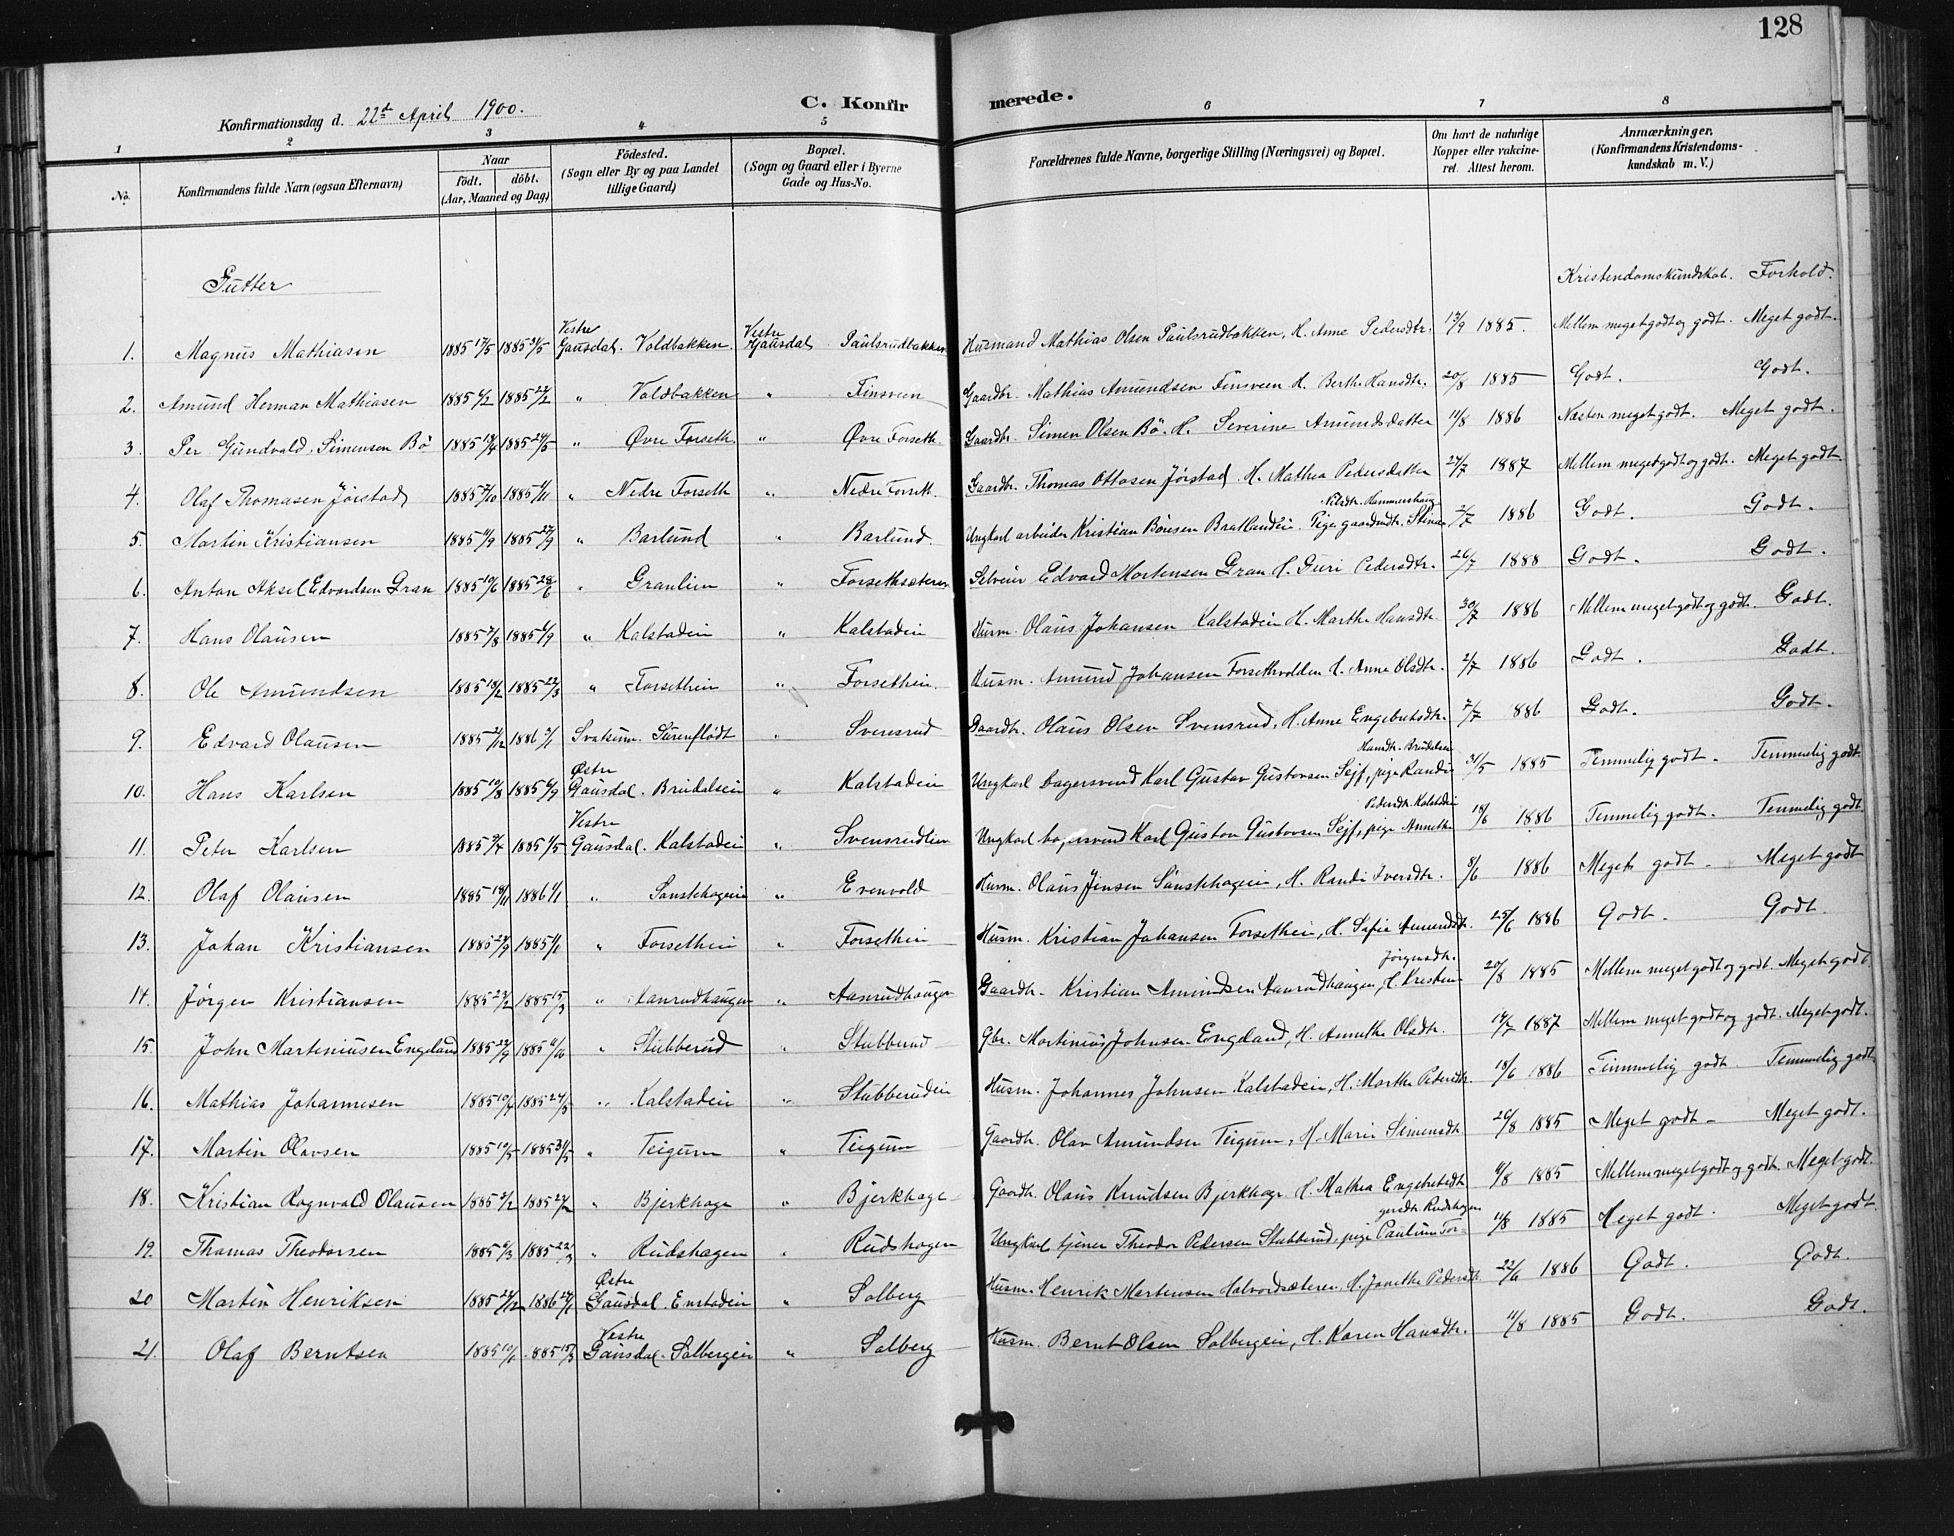 SAH, Vestre Gausdal prestekontor, Klokkerbok nr. 3, 1896-1925, s. 128